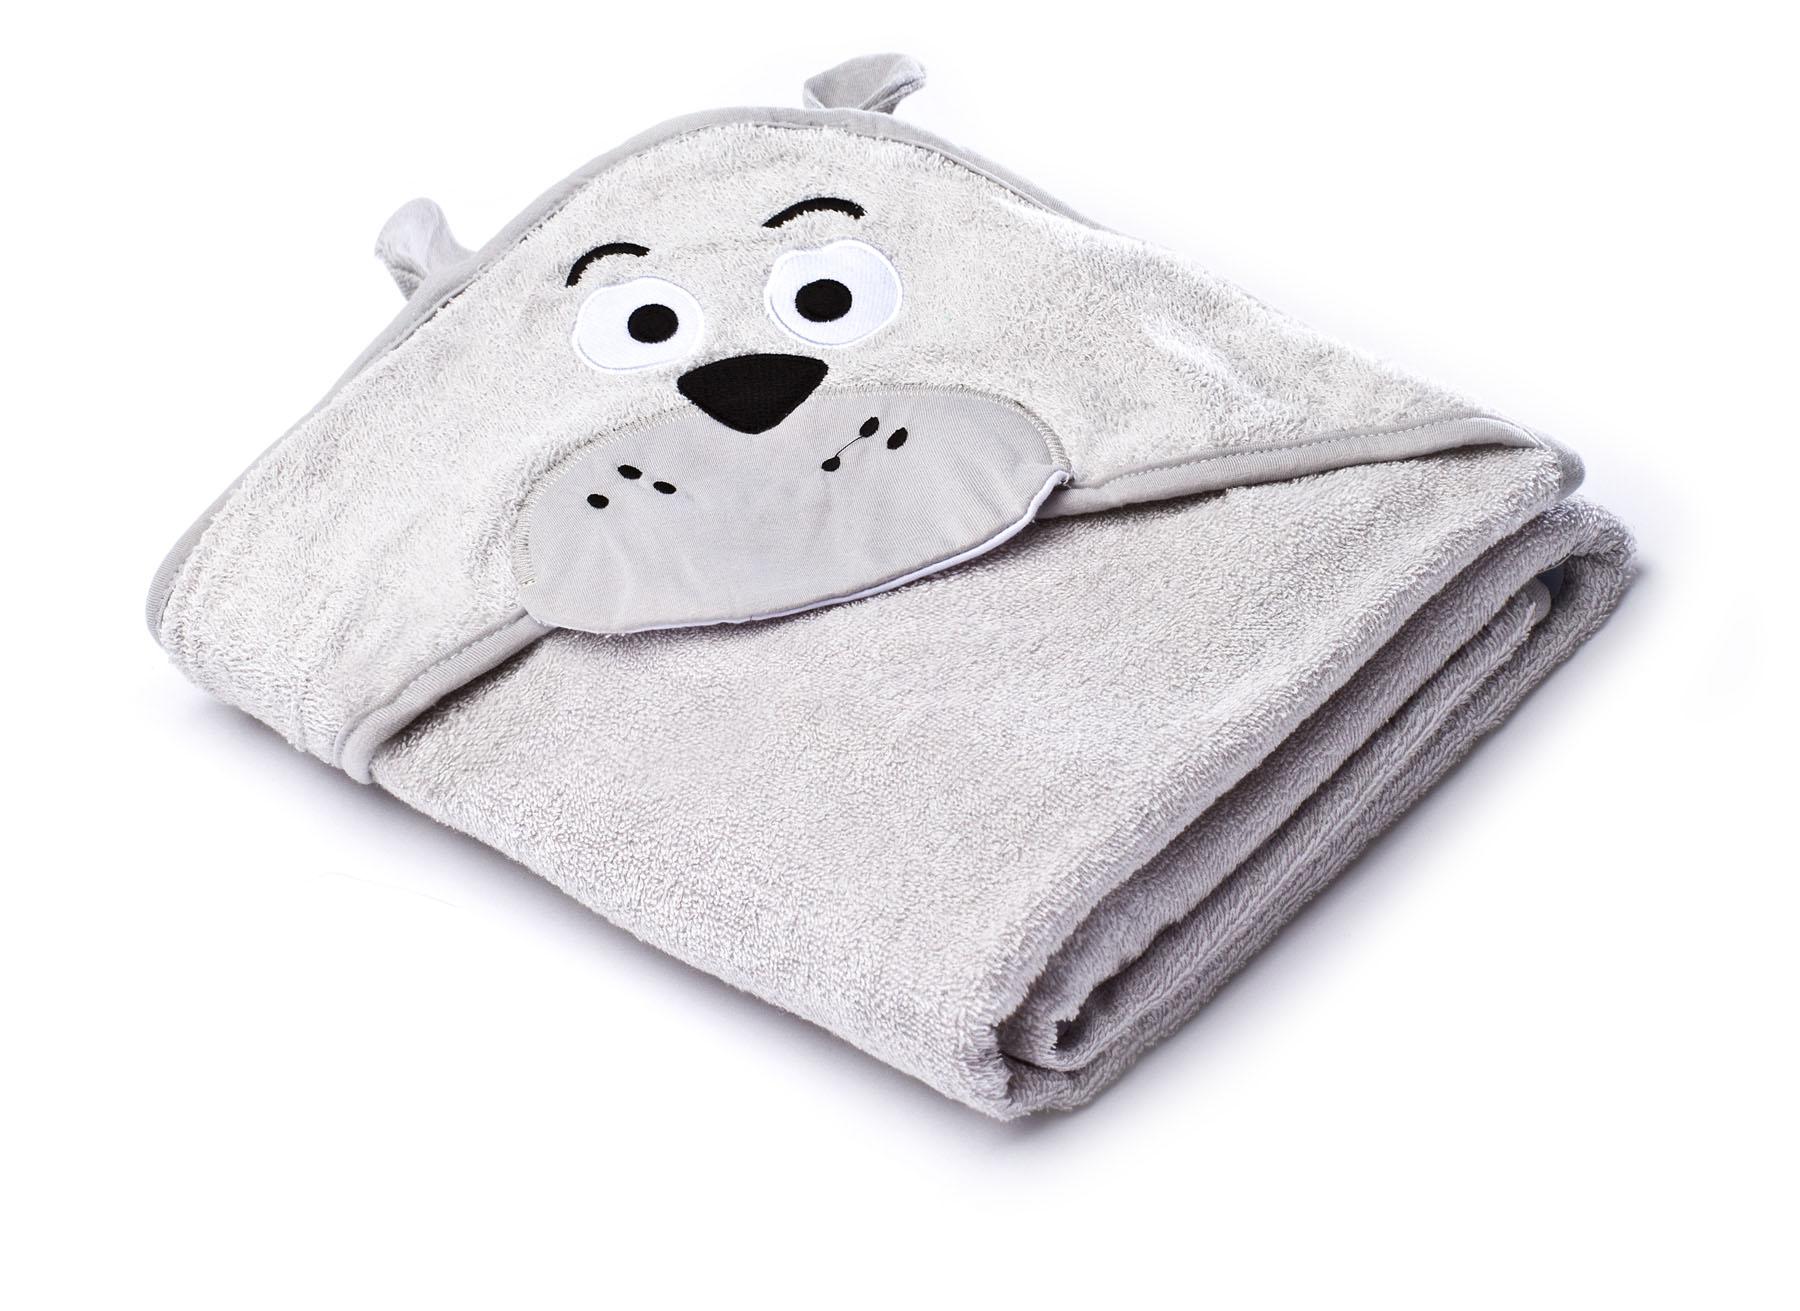 Water Friends soft bath towel – gray teddy bear